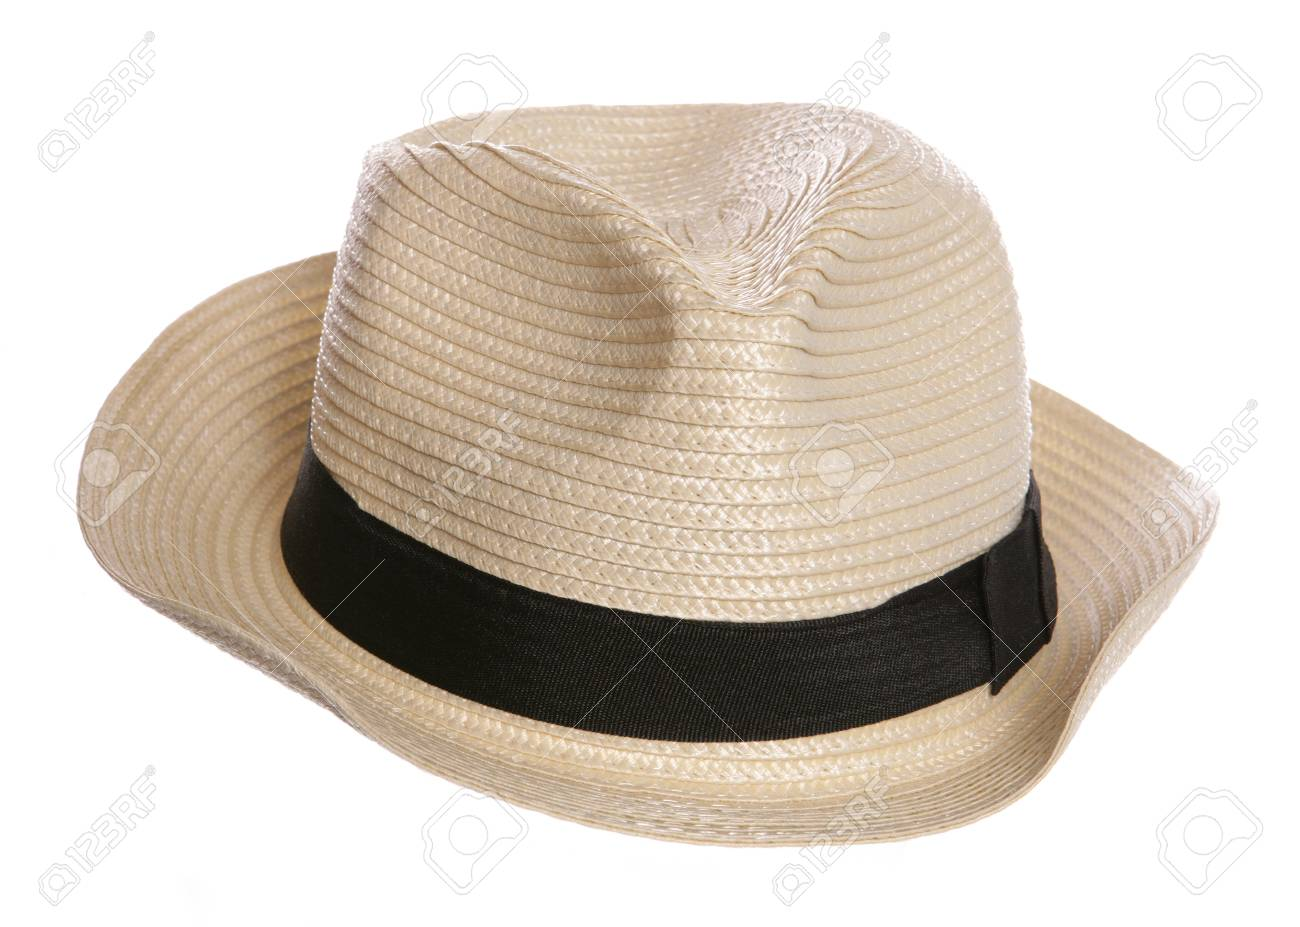 posh old mans hat studio cutout Stock Photo - 20891117 e80ff6a9085